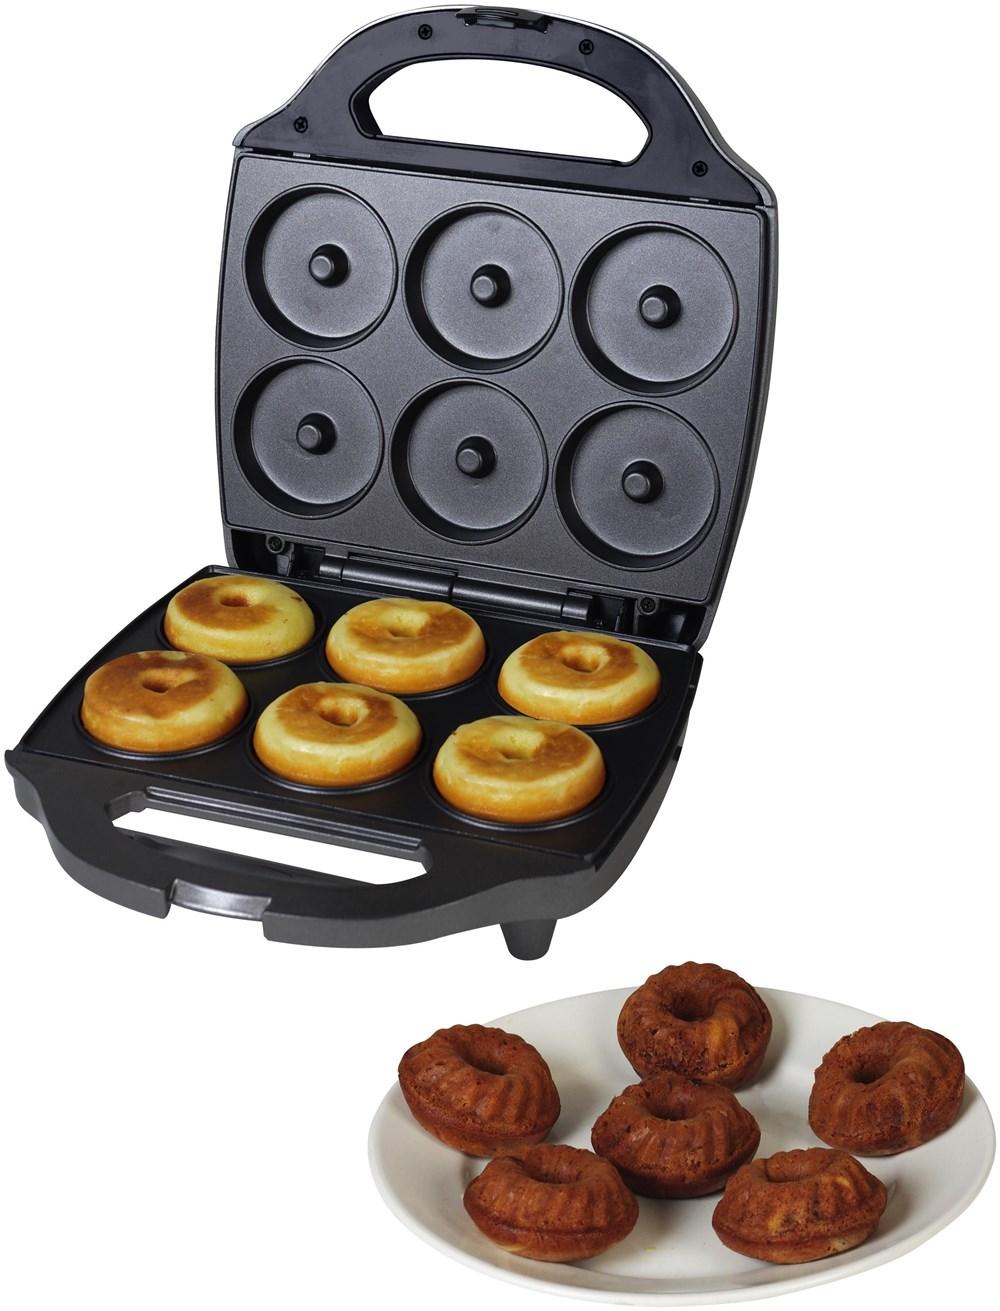 efbe schott tkg ckm 1002 nyc gugelhupf maker schwarz waffeleisen sandwichautomaten. Black Bedroom Furniture Sets. Home Design Ideas